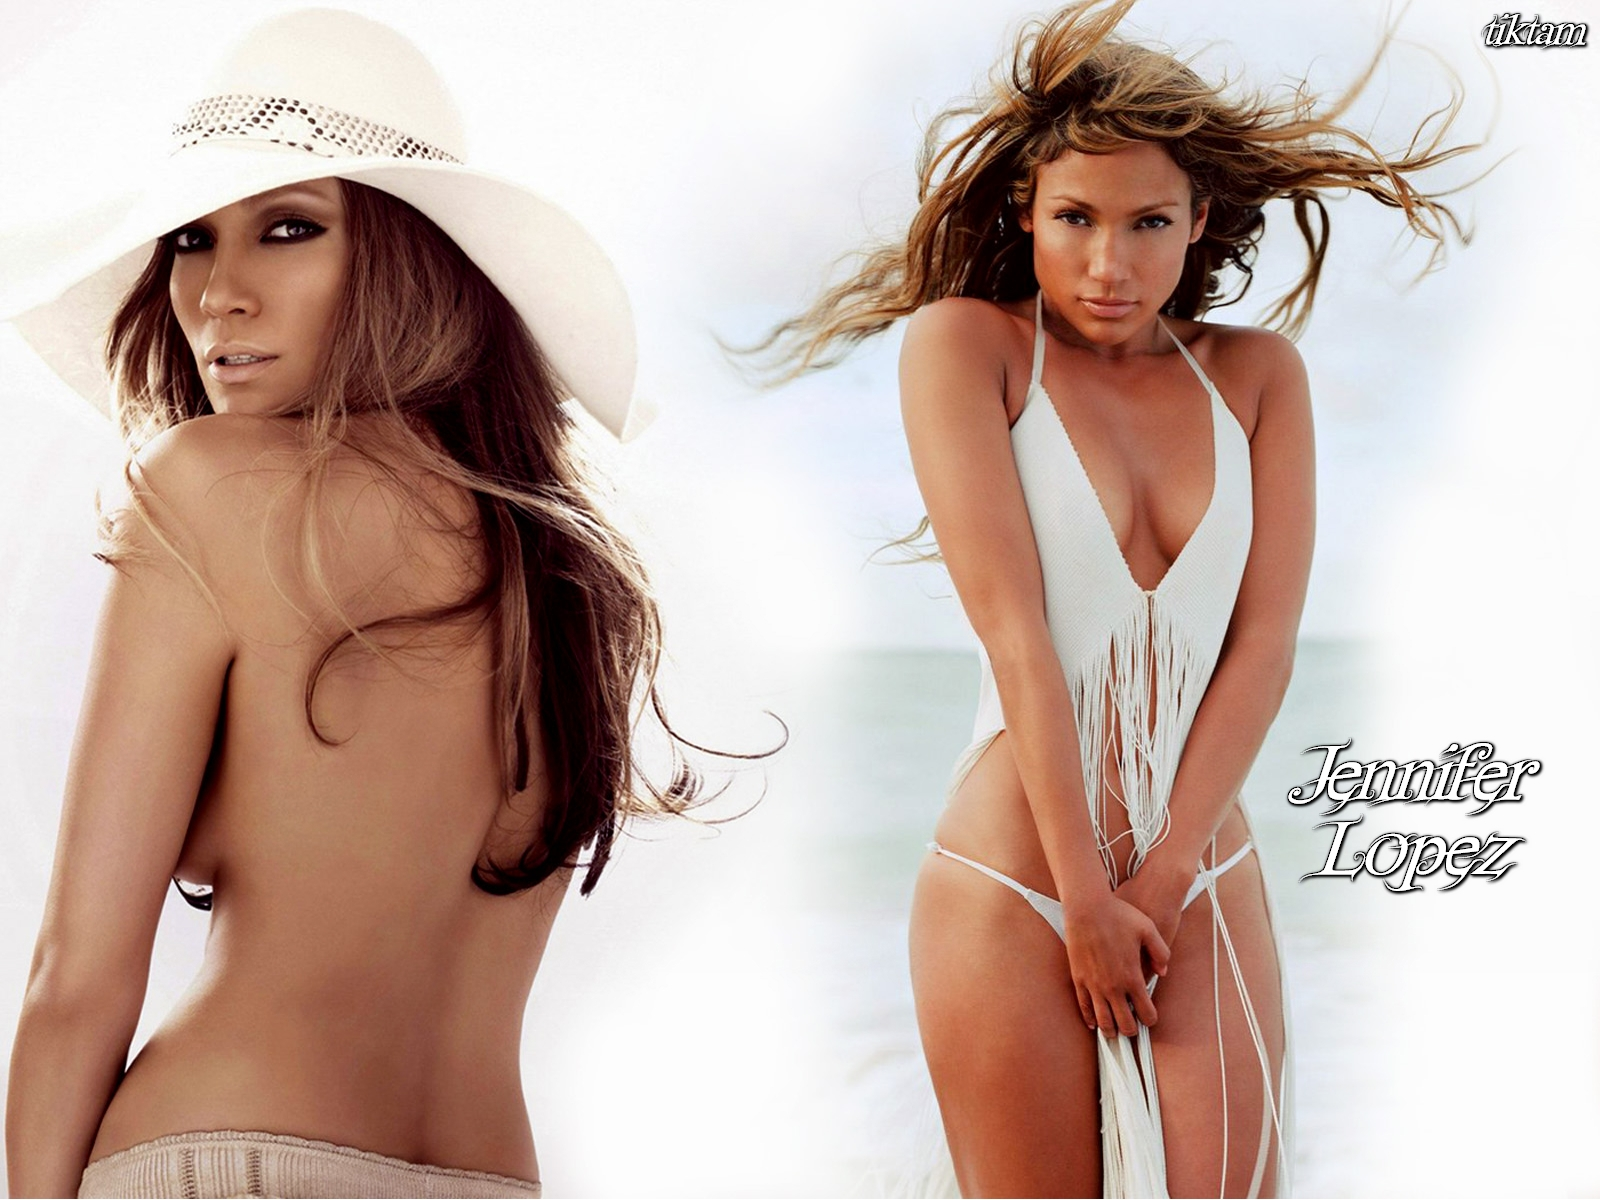 http://3.bp.blogspot.com/-epPm6ZEl8I0/TaYXLqXv7rI/AAAAAAAABXc/Wk4gRruSgtM/s1600/Jennifer+Lopez64.jpg